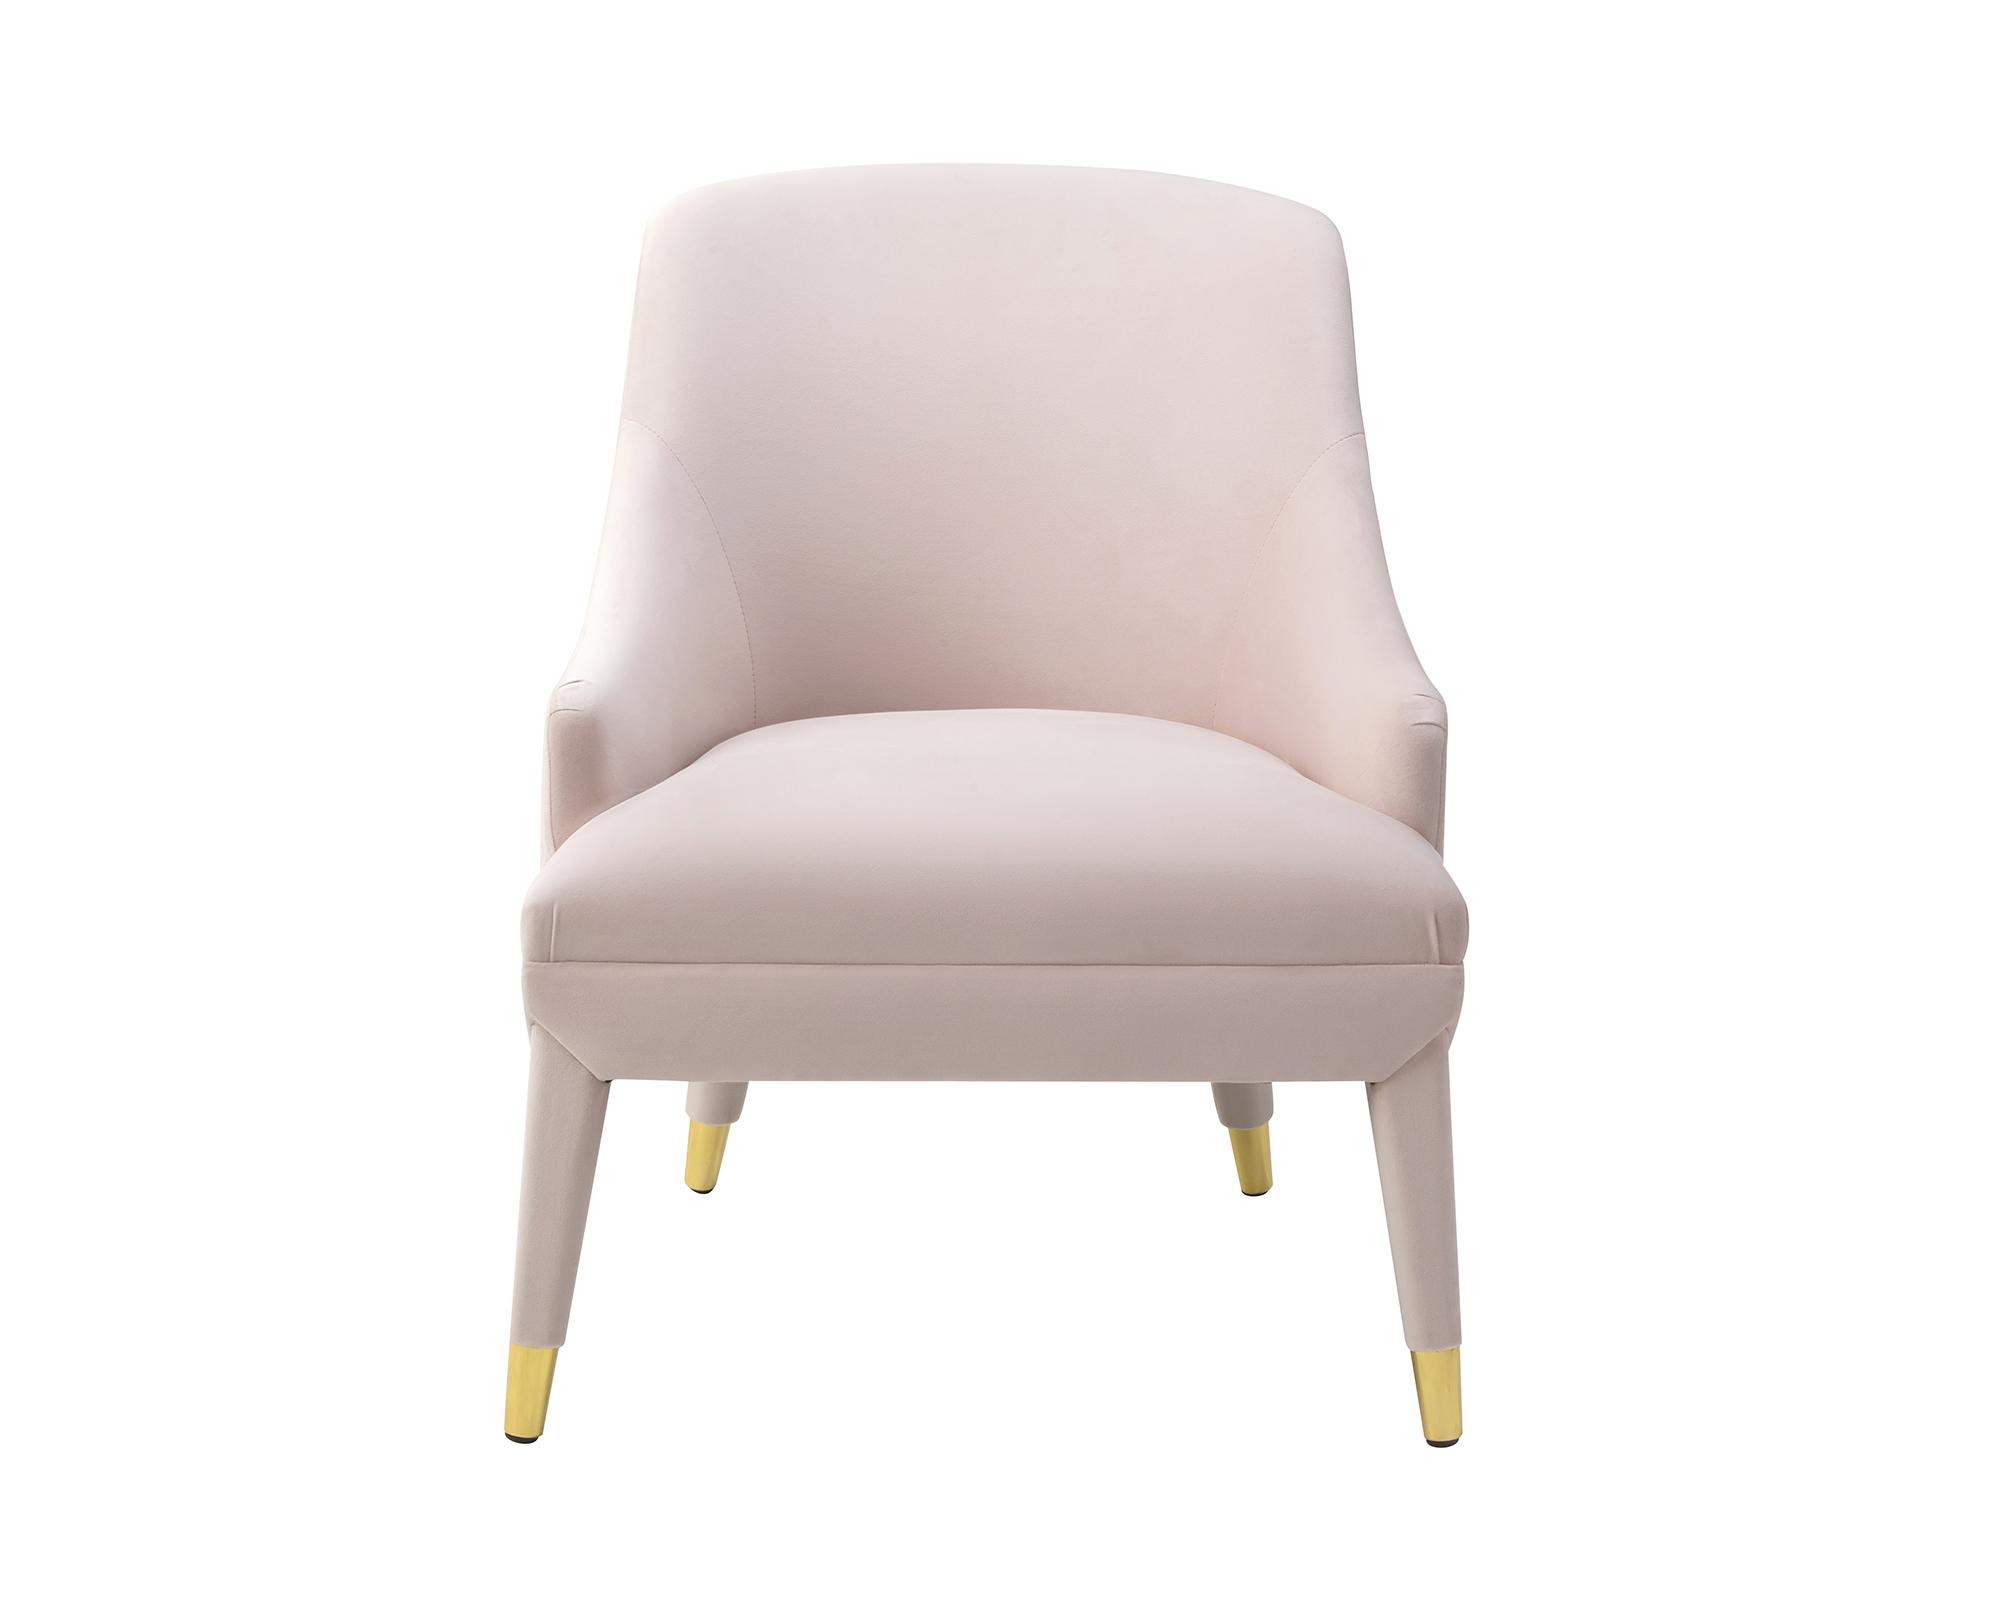 Liang & Eimil Sylvia Occasional Chair Blush Velvet BH-OCH-092 (2)